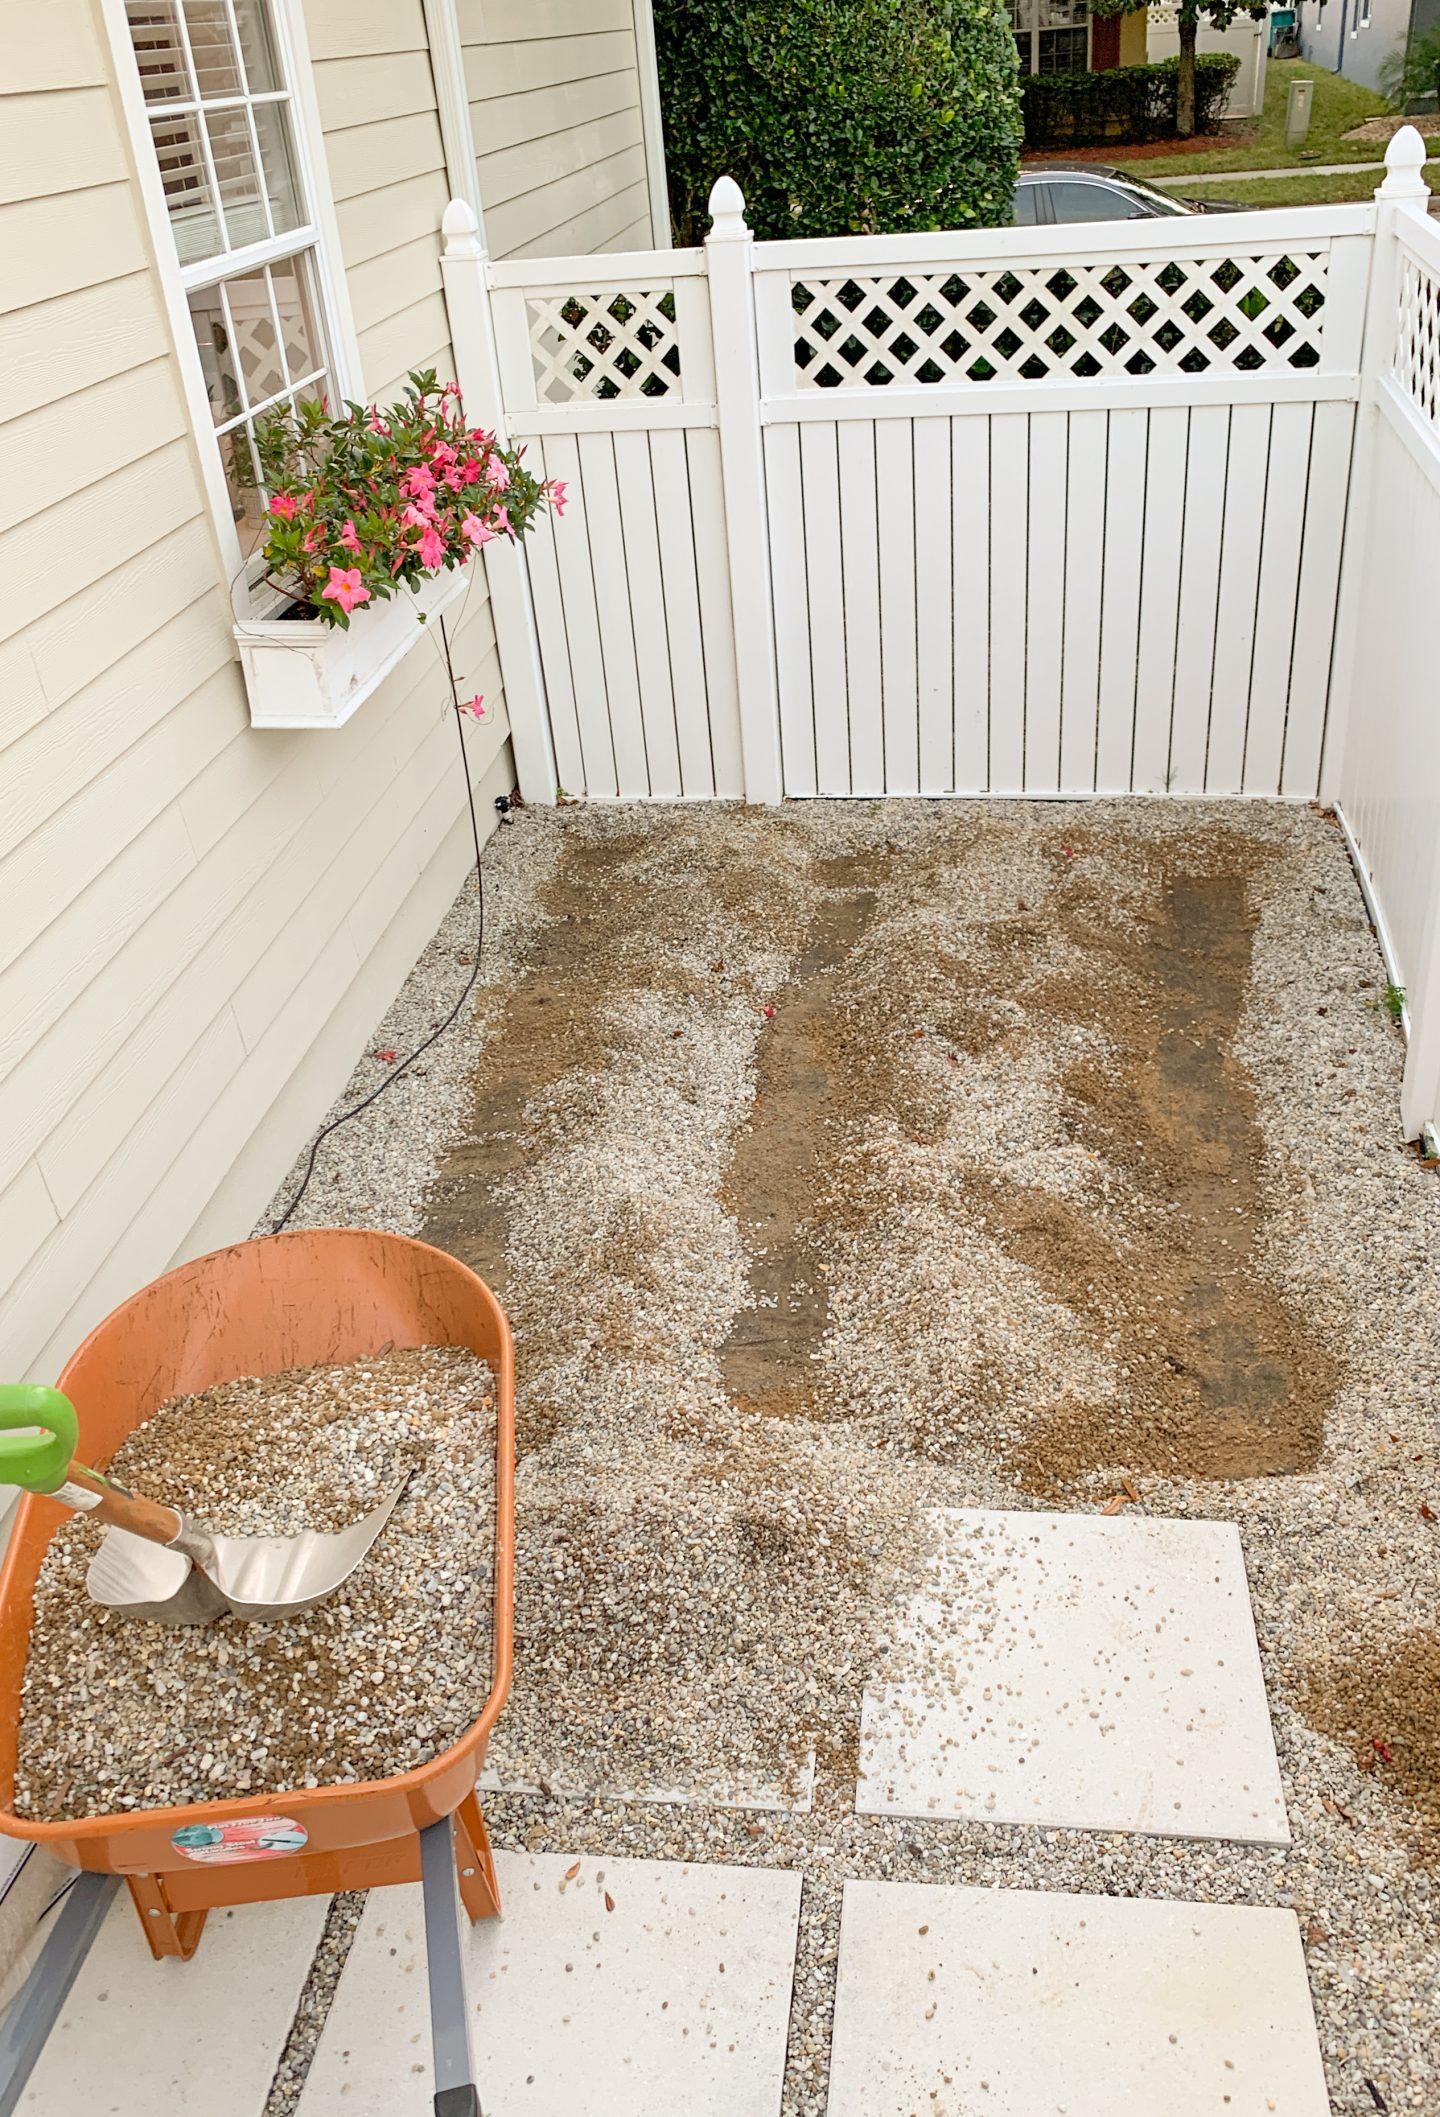 digging area for DIY wood deck